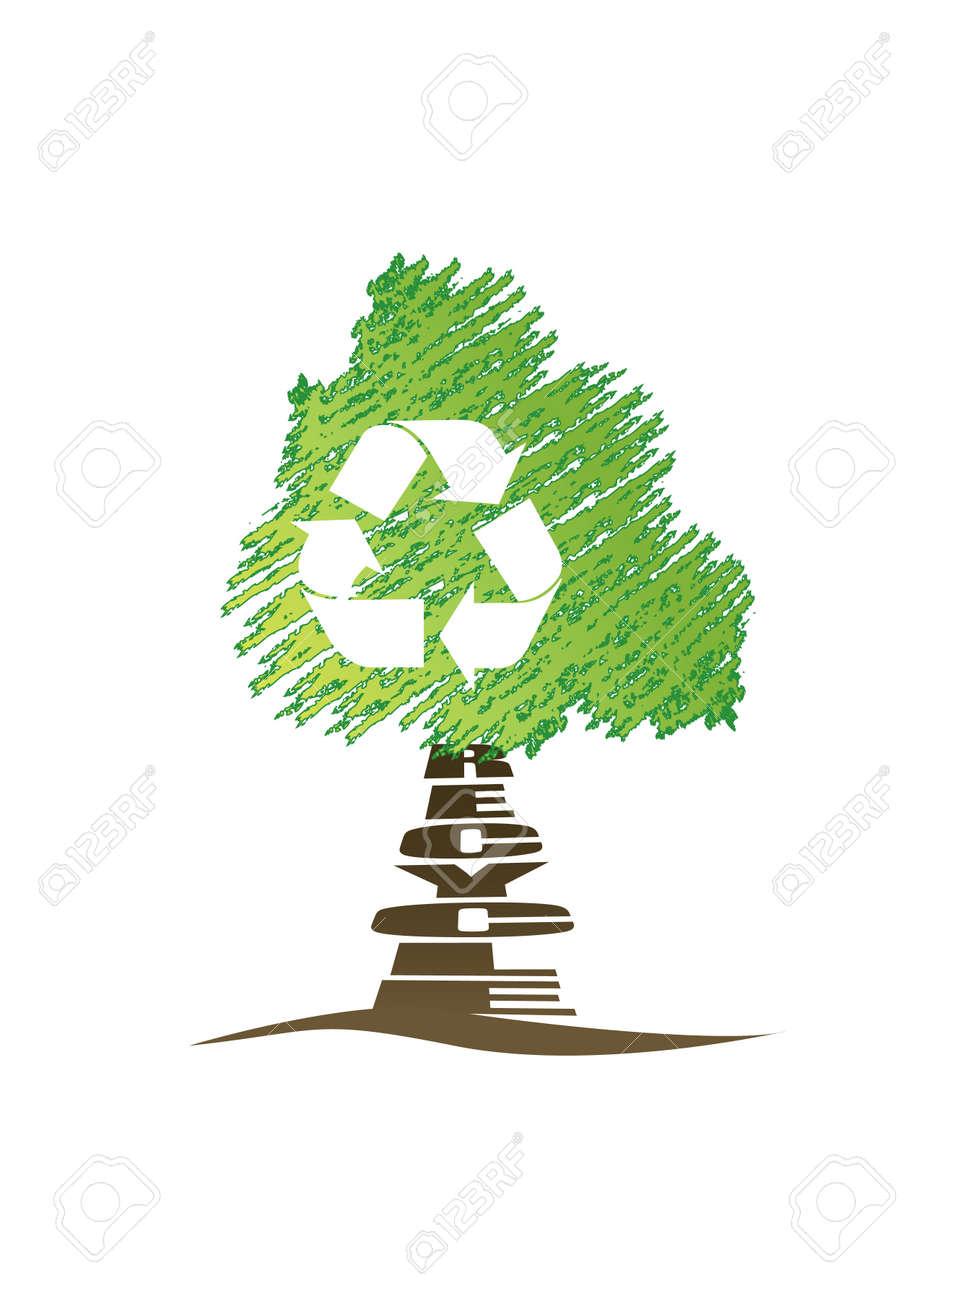 Recycle tree Stock Vector - 3278307